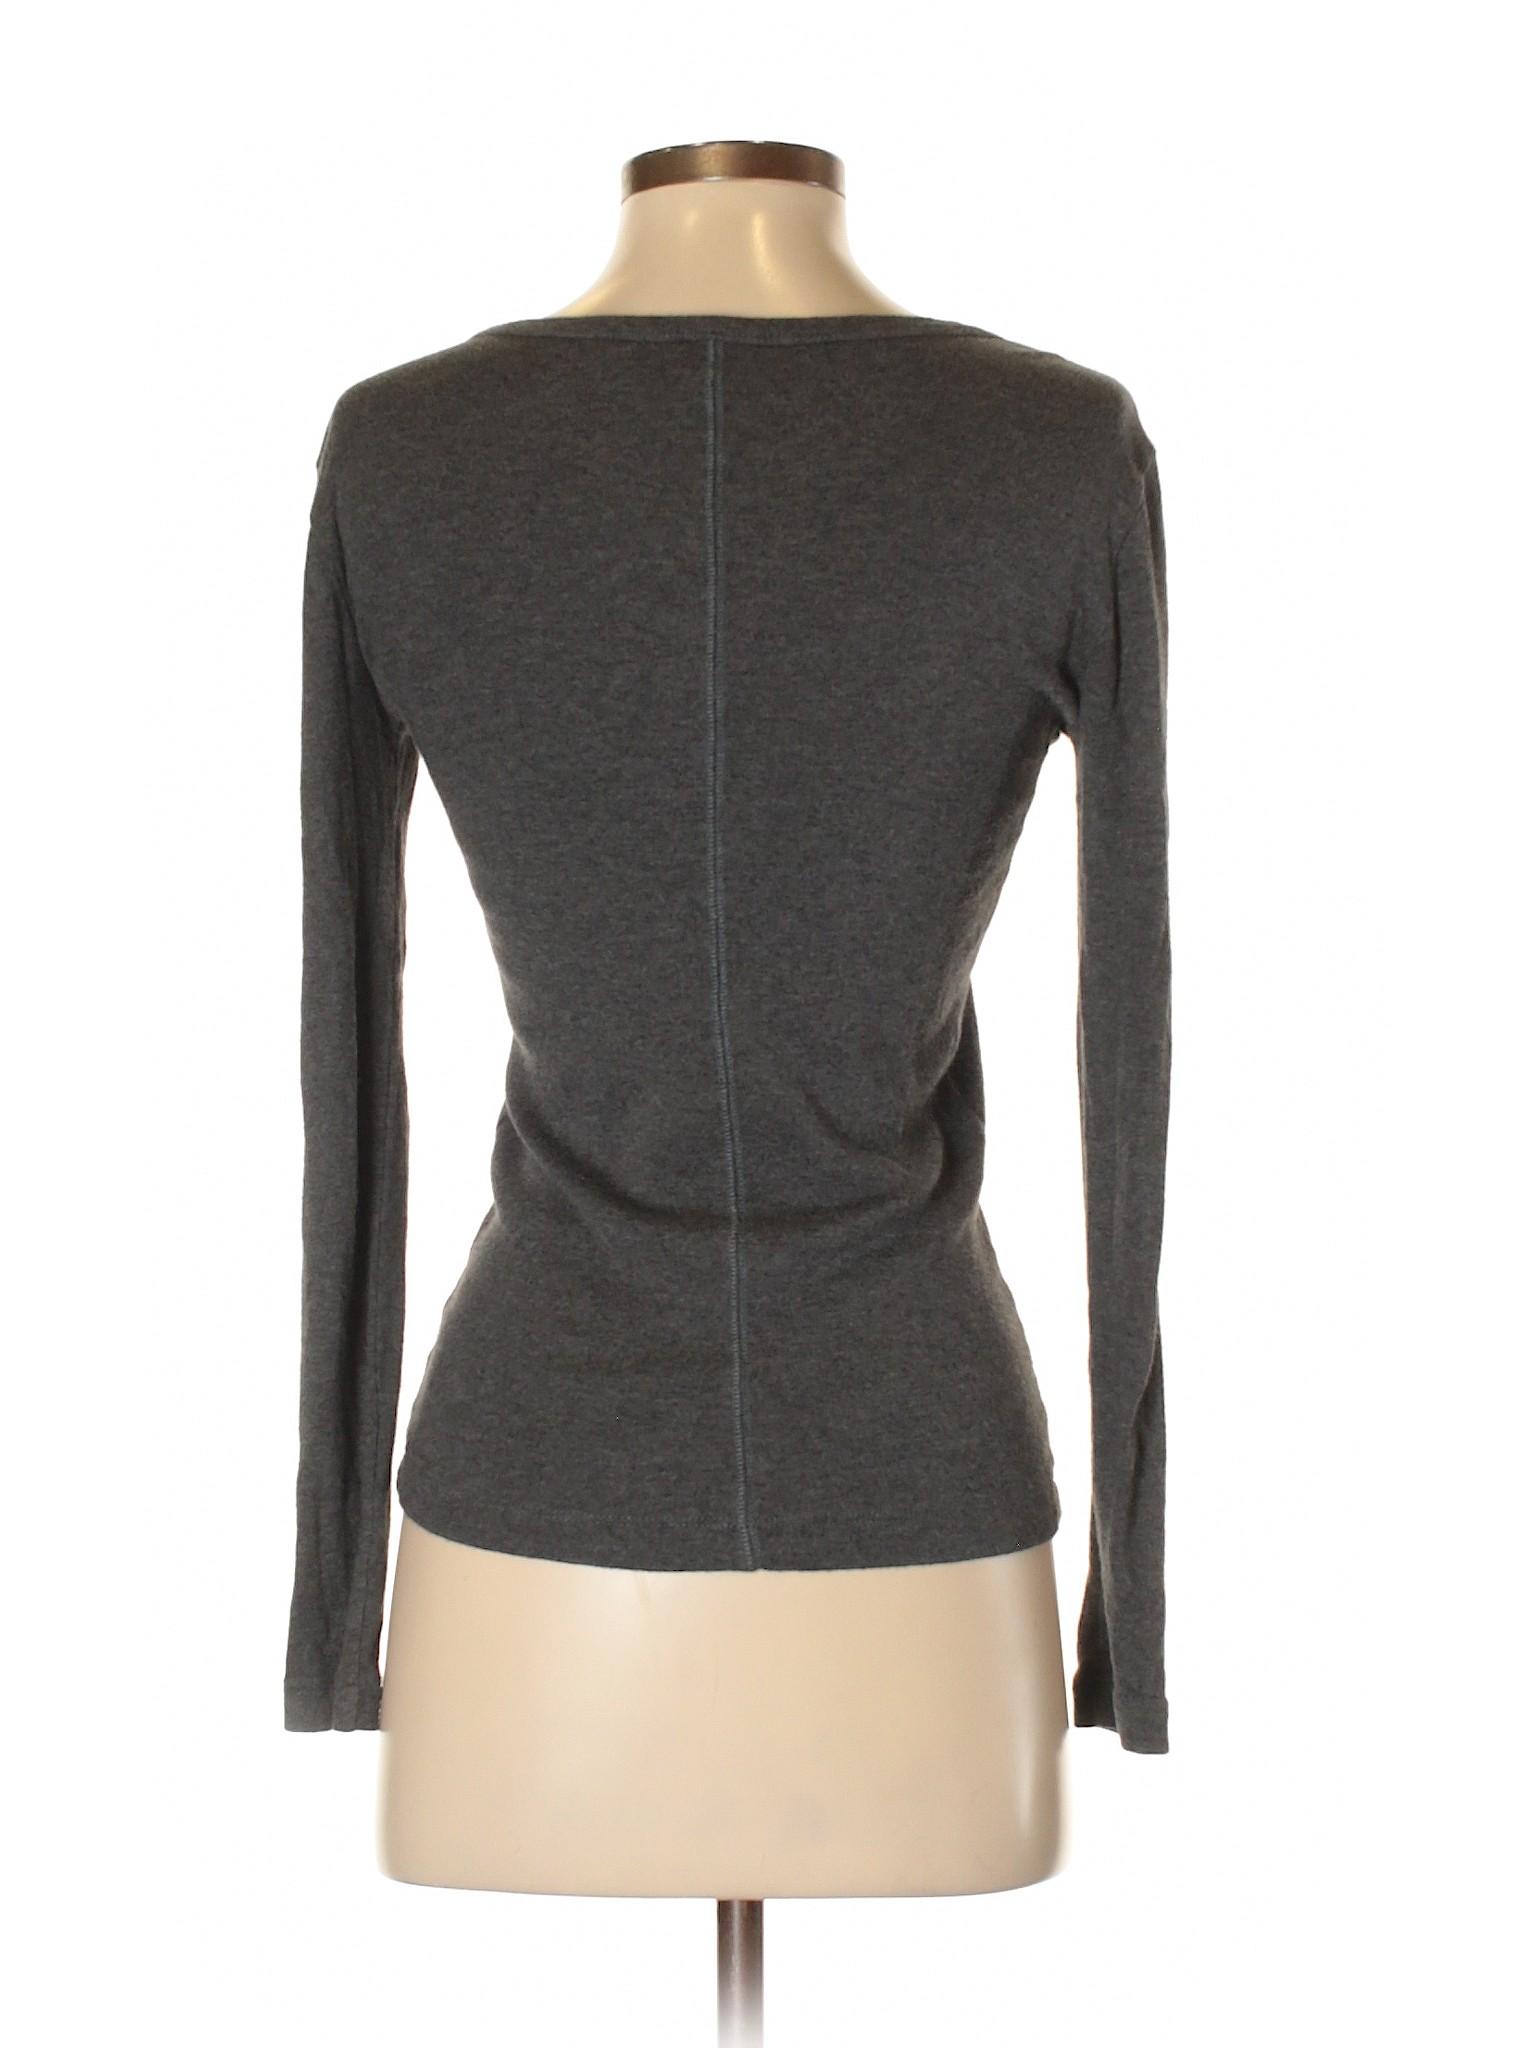 Gap Boutique Pullover Boutique Gap Pullover Sweater Sweater RFFxWzHcn